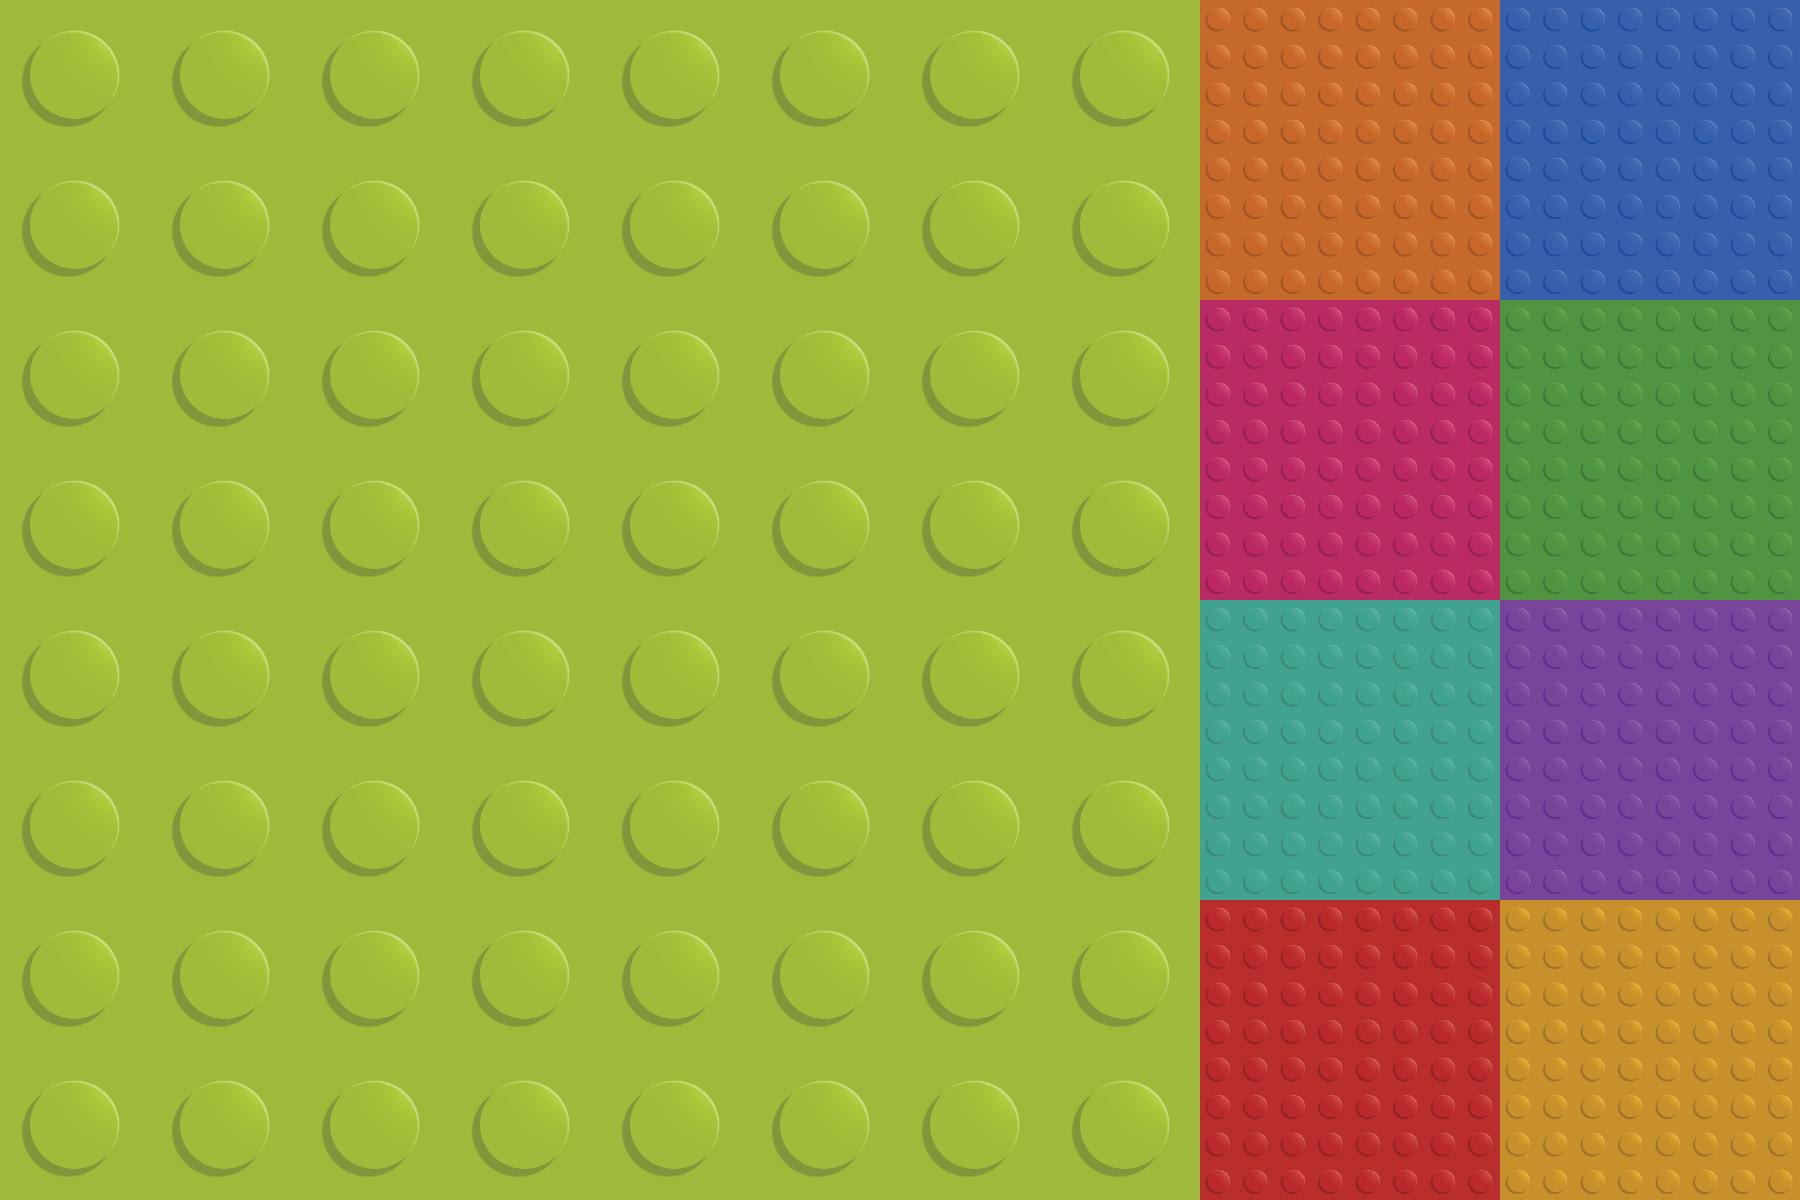 printable lego background pattern